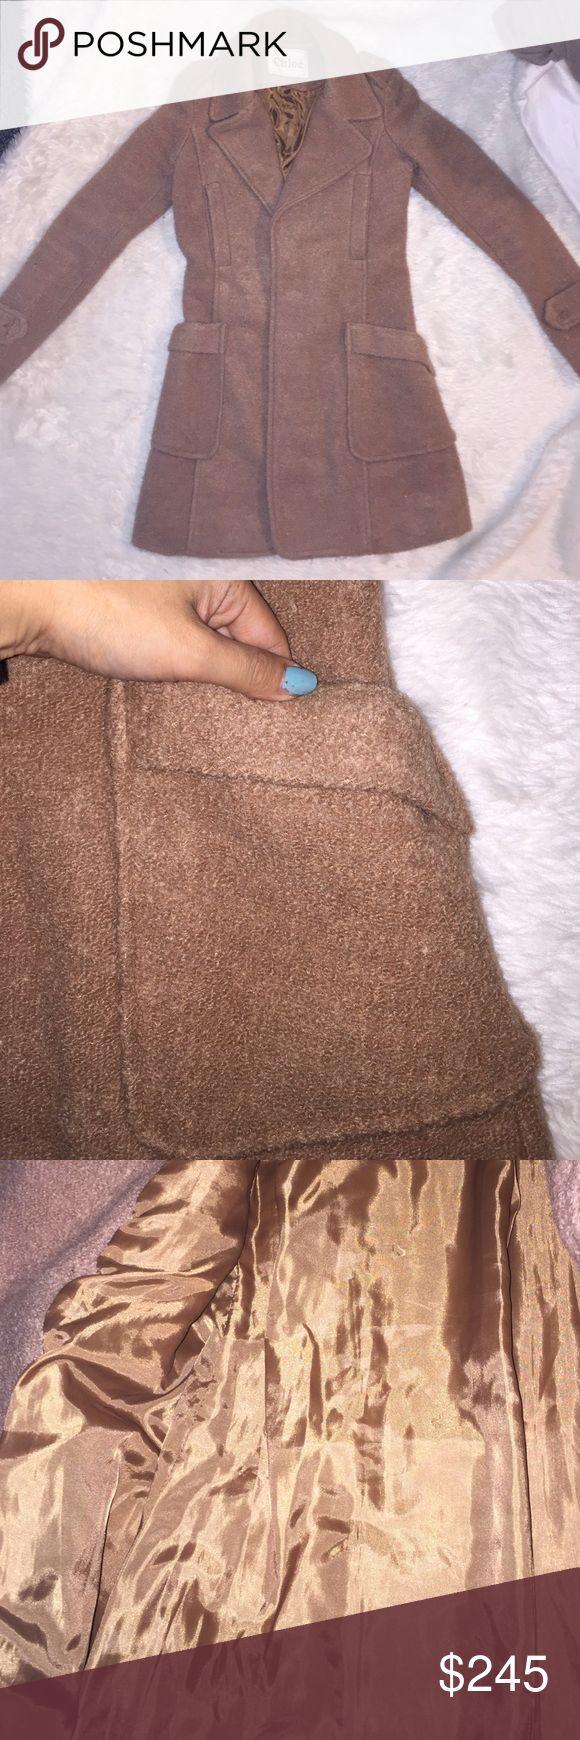 Chloe wool coat Camel tan color Chloe coat Chloe Jackets & Coats Pea Coats